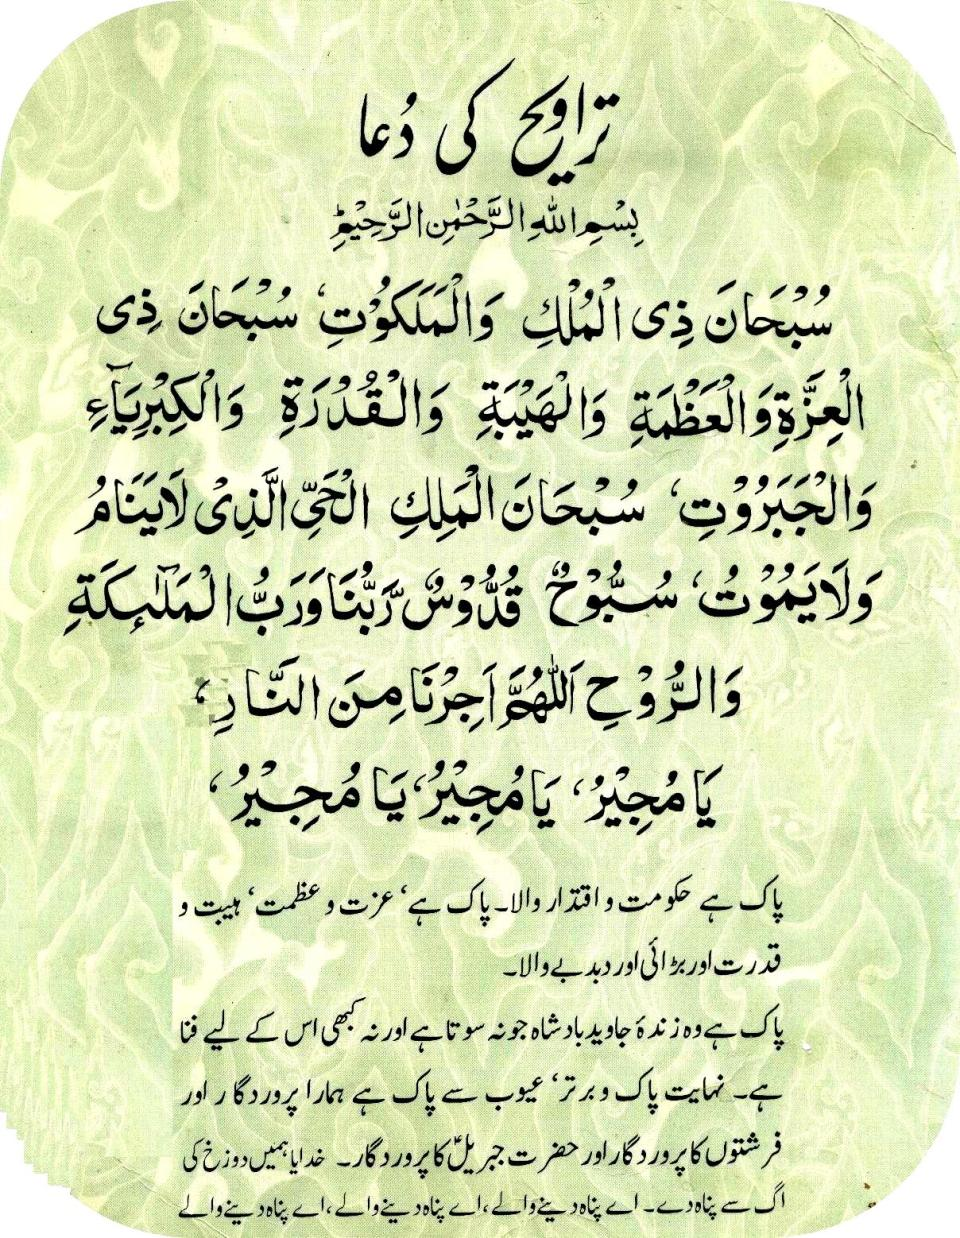 Ramadan tasbih taraweeh dua in urdu 2013